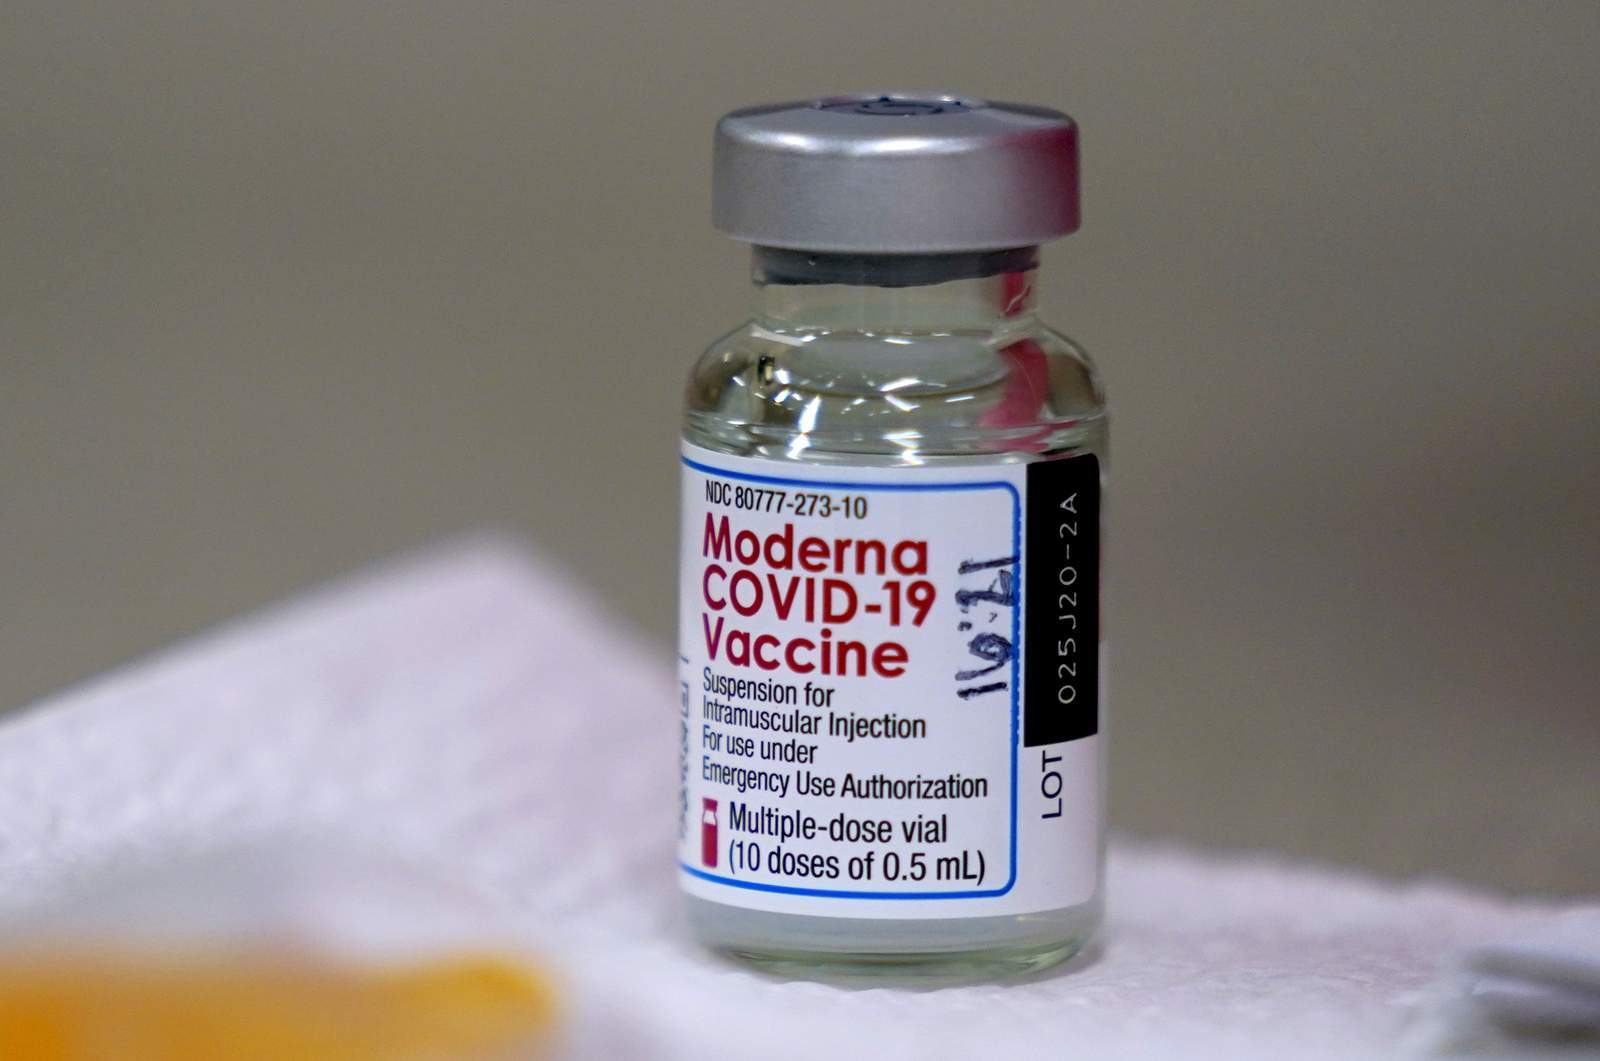 Modern COVID-19 Vaccine